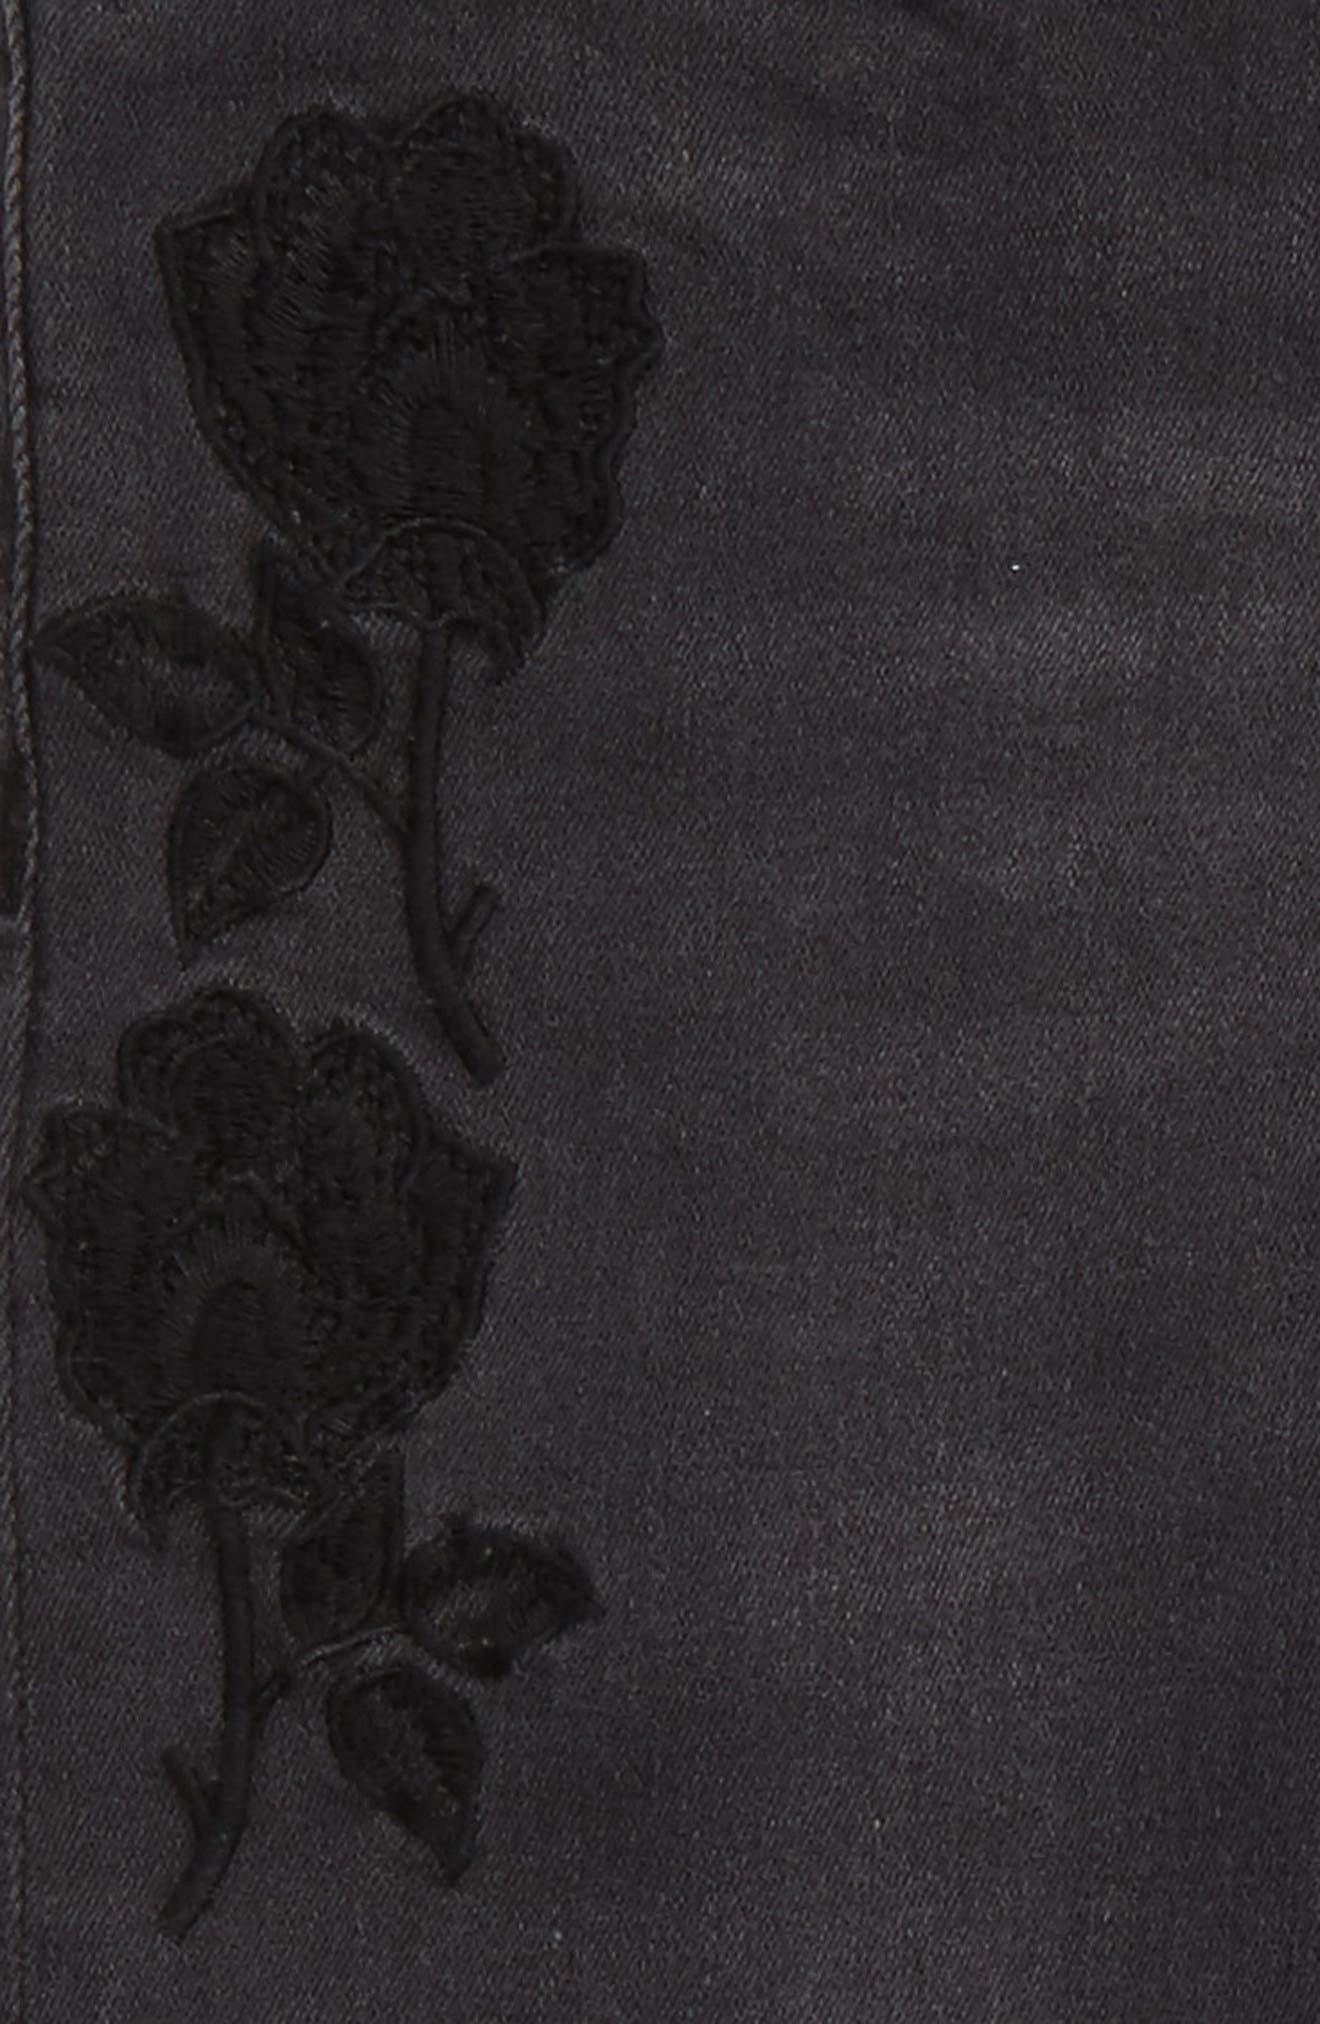 Black Iris Skinny Jeans,                             Alternate thumbnail 3, color,                             008